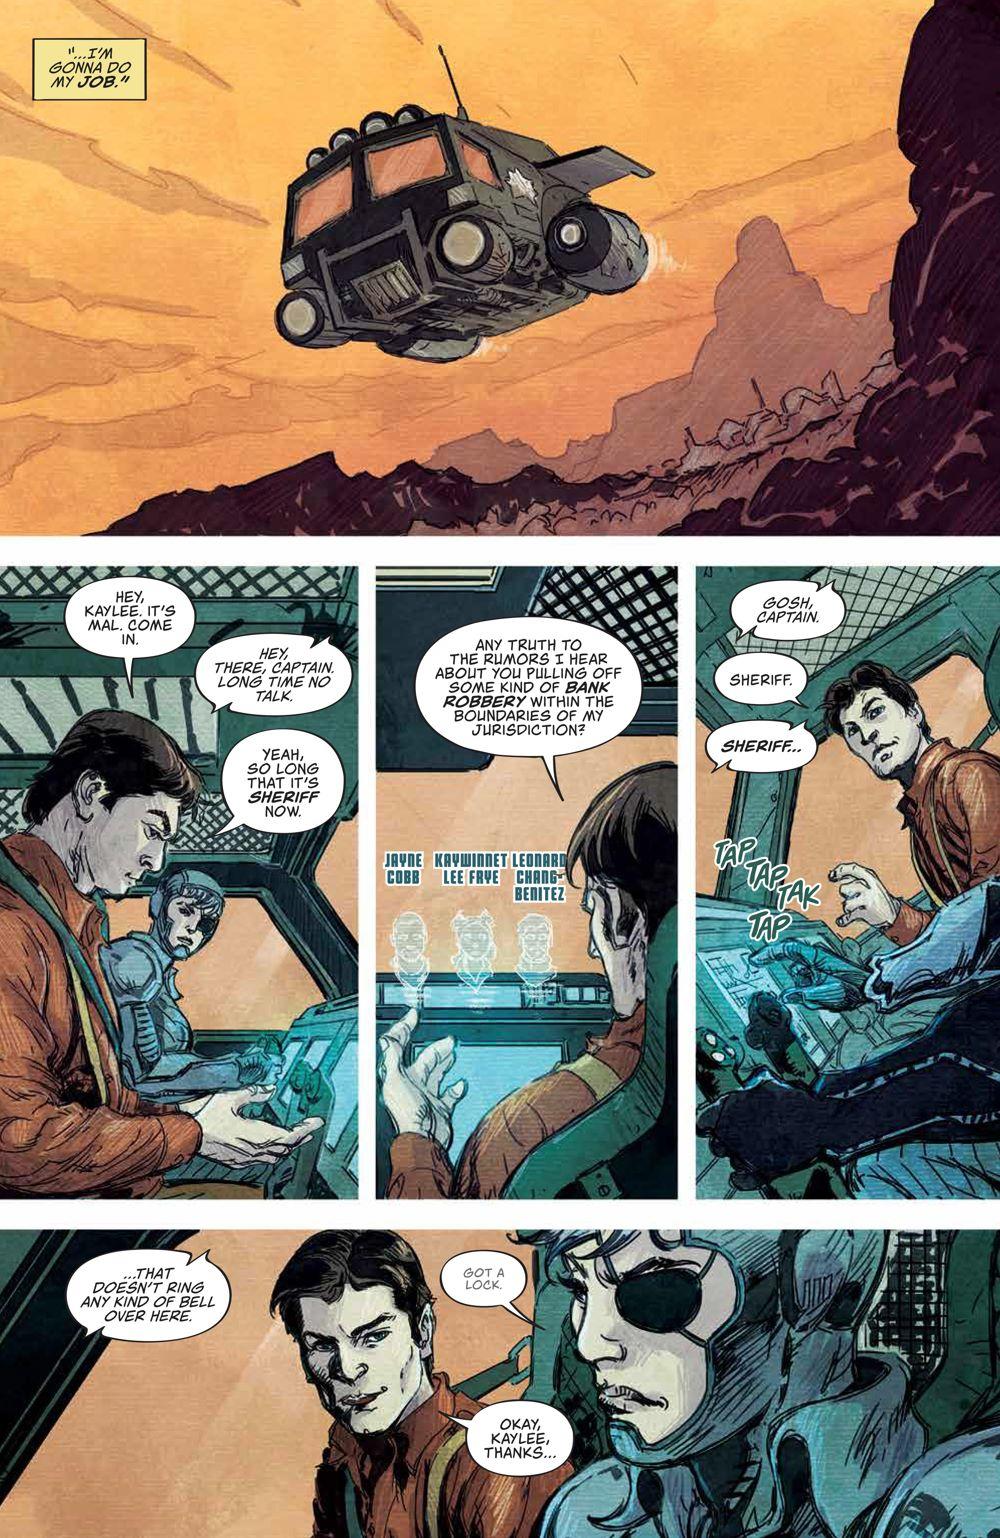 Firefly_NewSheriffVerse_v1_HC_PRESS_58 ComicList Previews: FIREFLY NEW SHERIFF IN THE 'VERSE VOLUME 1 HC